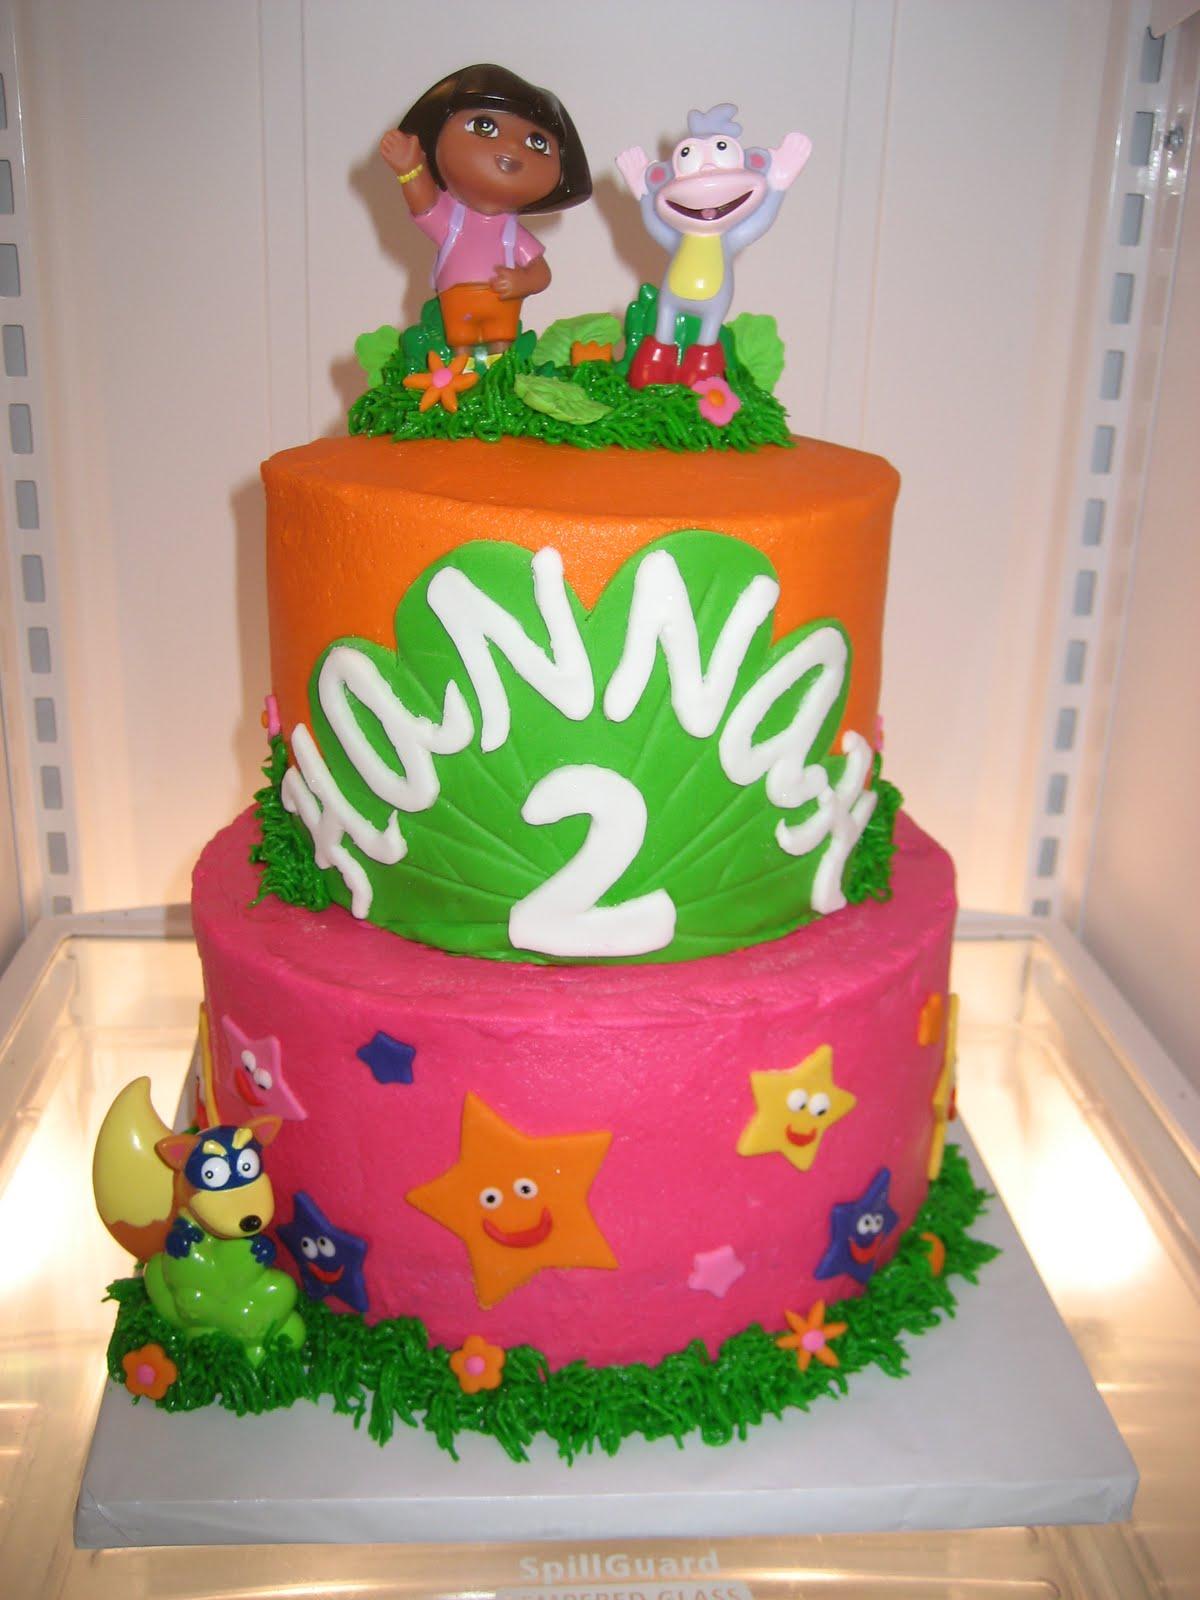 Ashley's Cakery: Dora the Explorer Cake